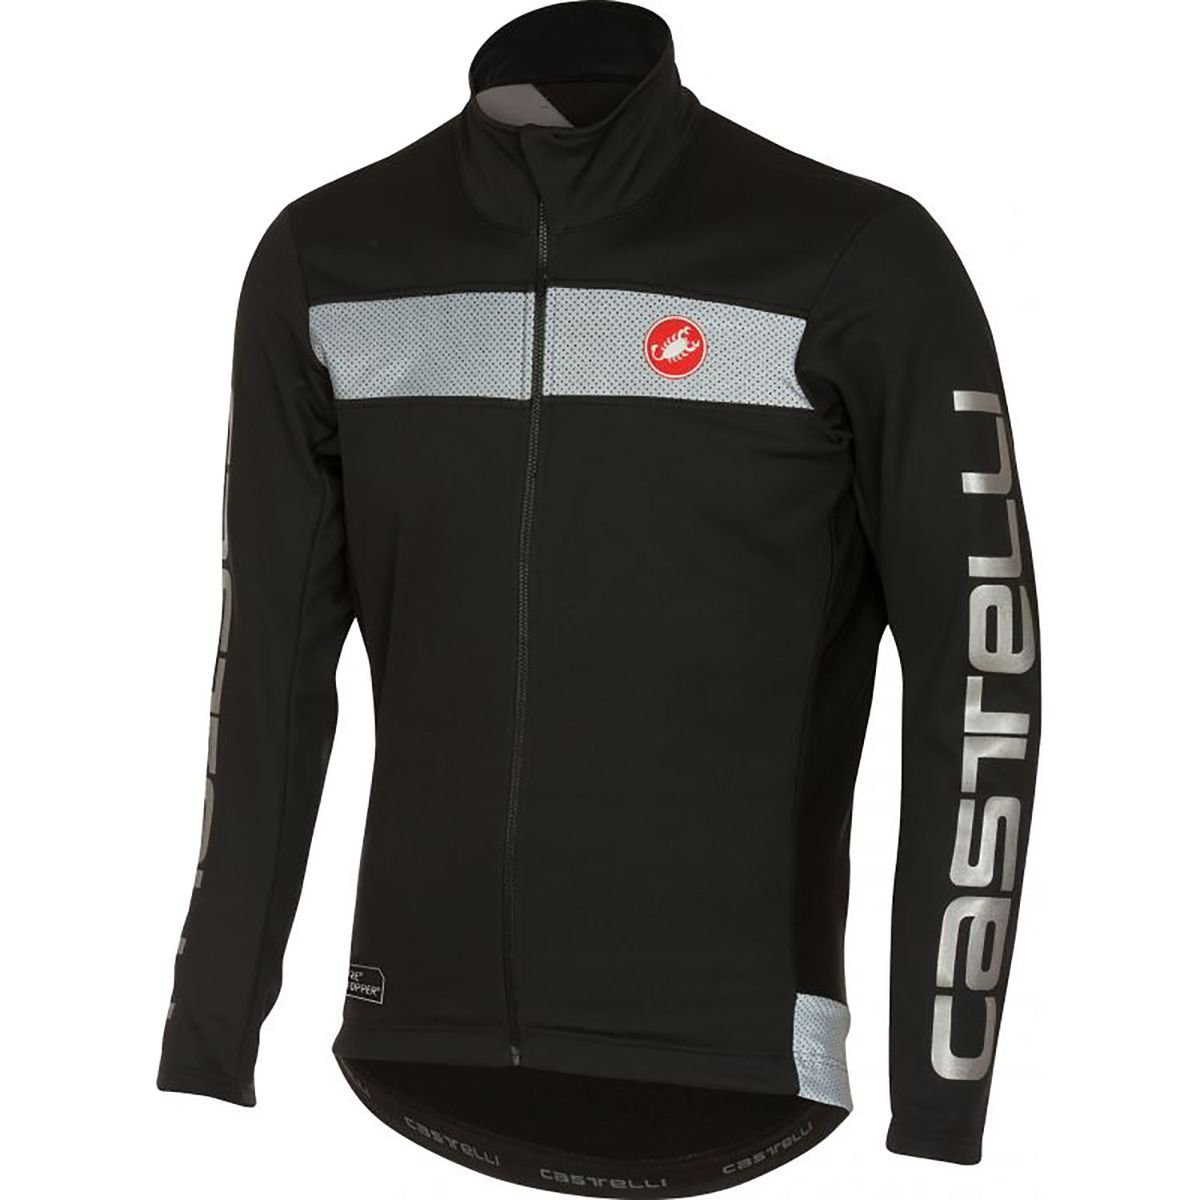 Castelli Raddoppia Jacket - Men's Black, M